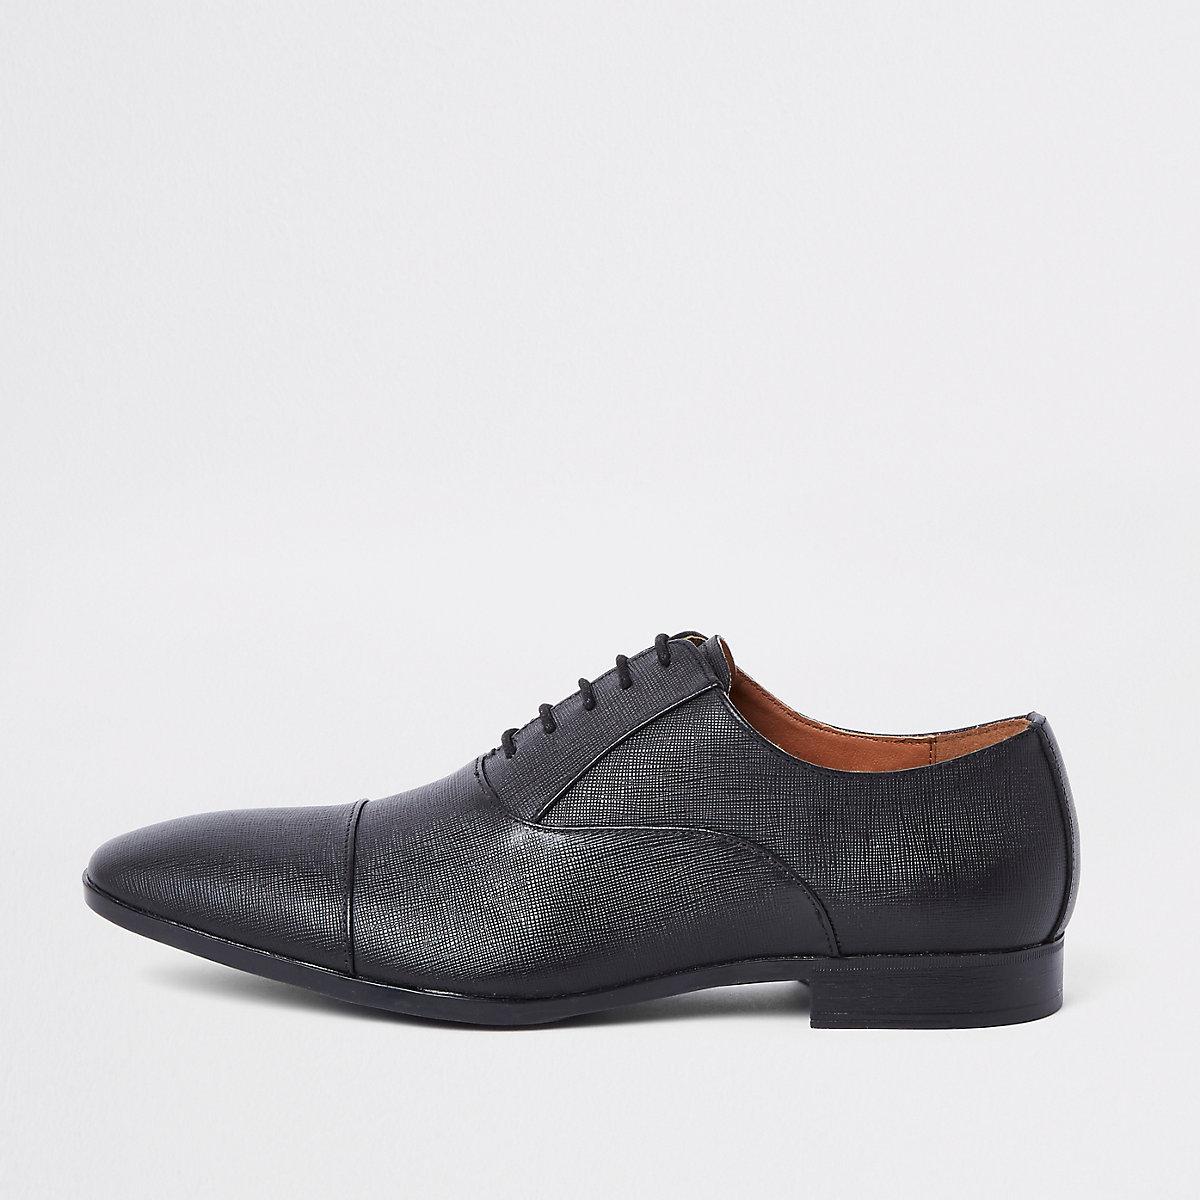 Black embossed toecap Oxford shoes